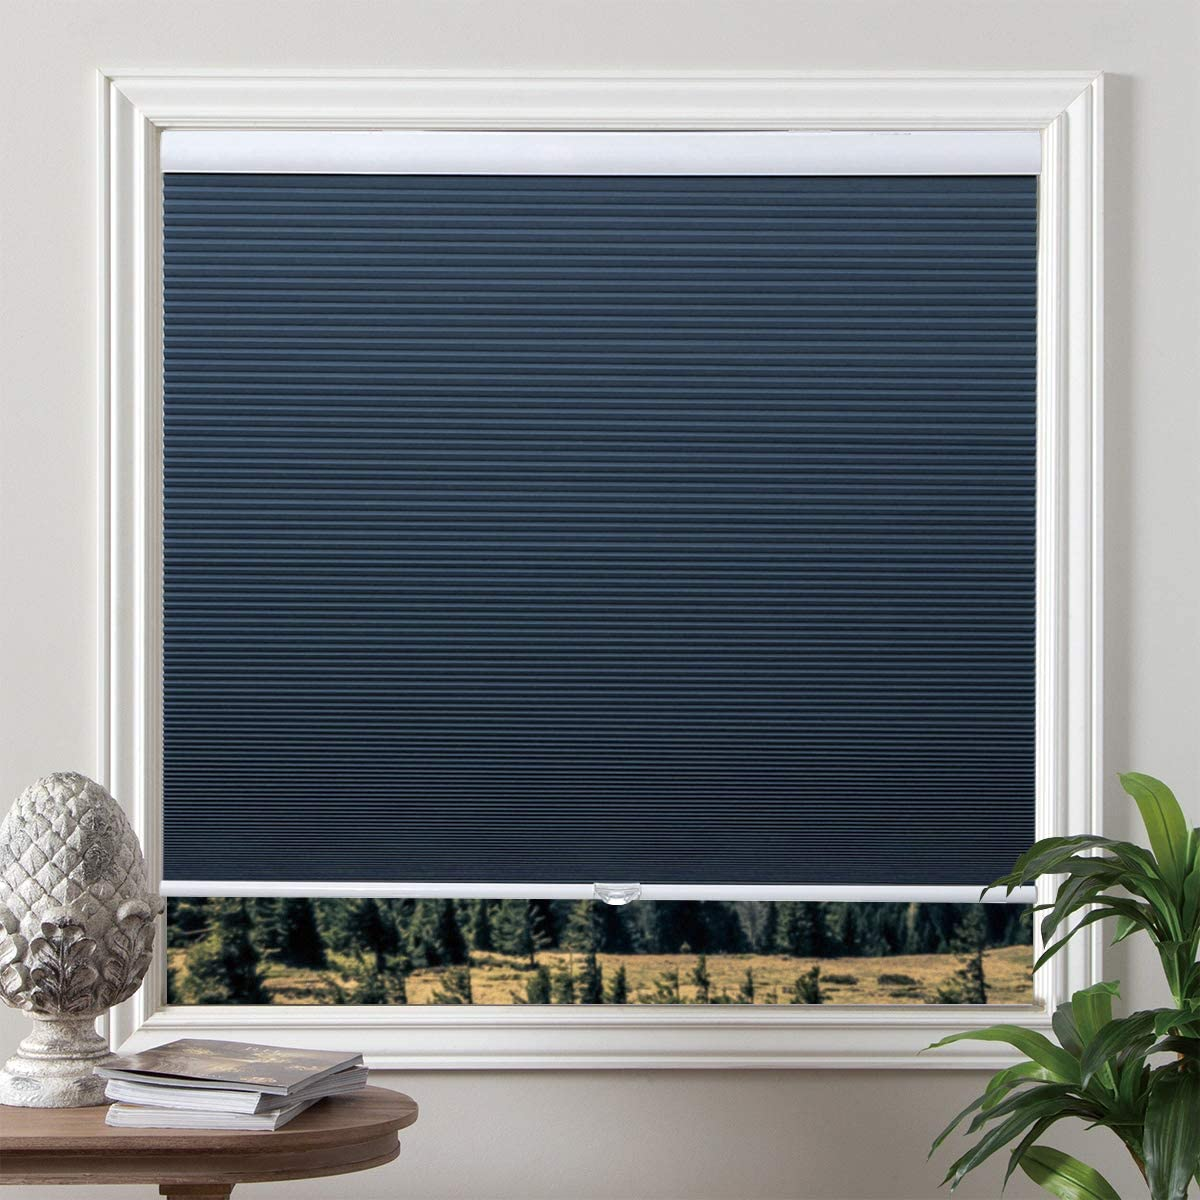 "Grandekor Cellular Shades Blackout Cordless Cellular Blinds Honeycomb Blinds Window Shades Room Darkening Shade Ocean Blue-White, 27""(W) x 64""(H)"